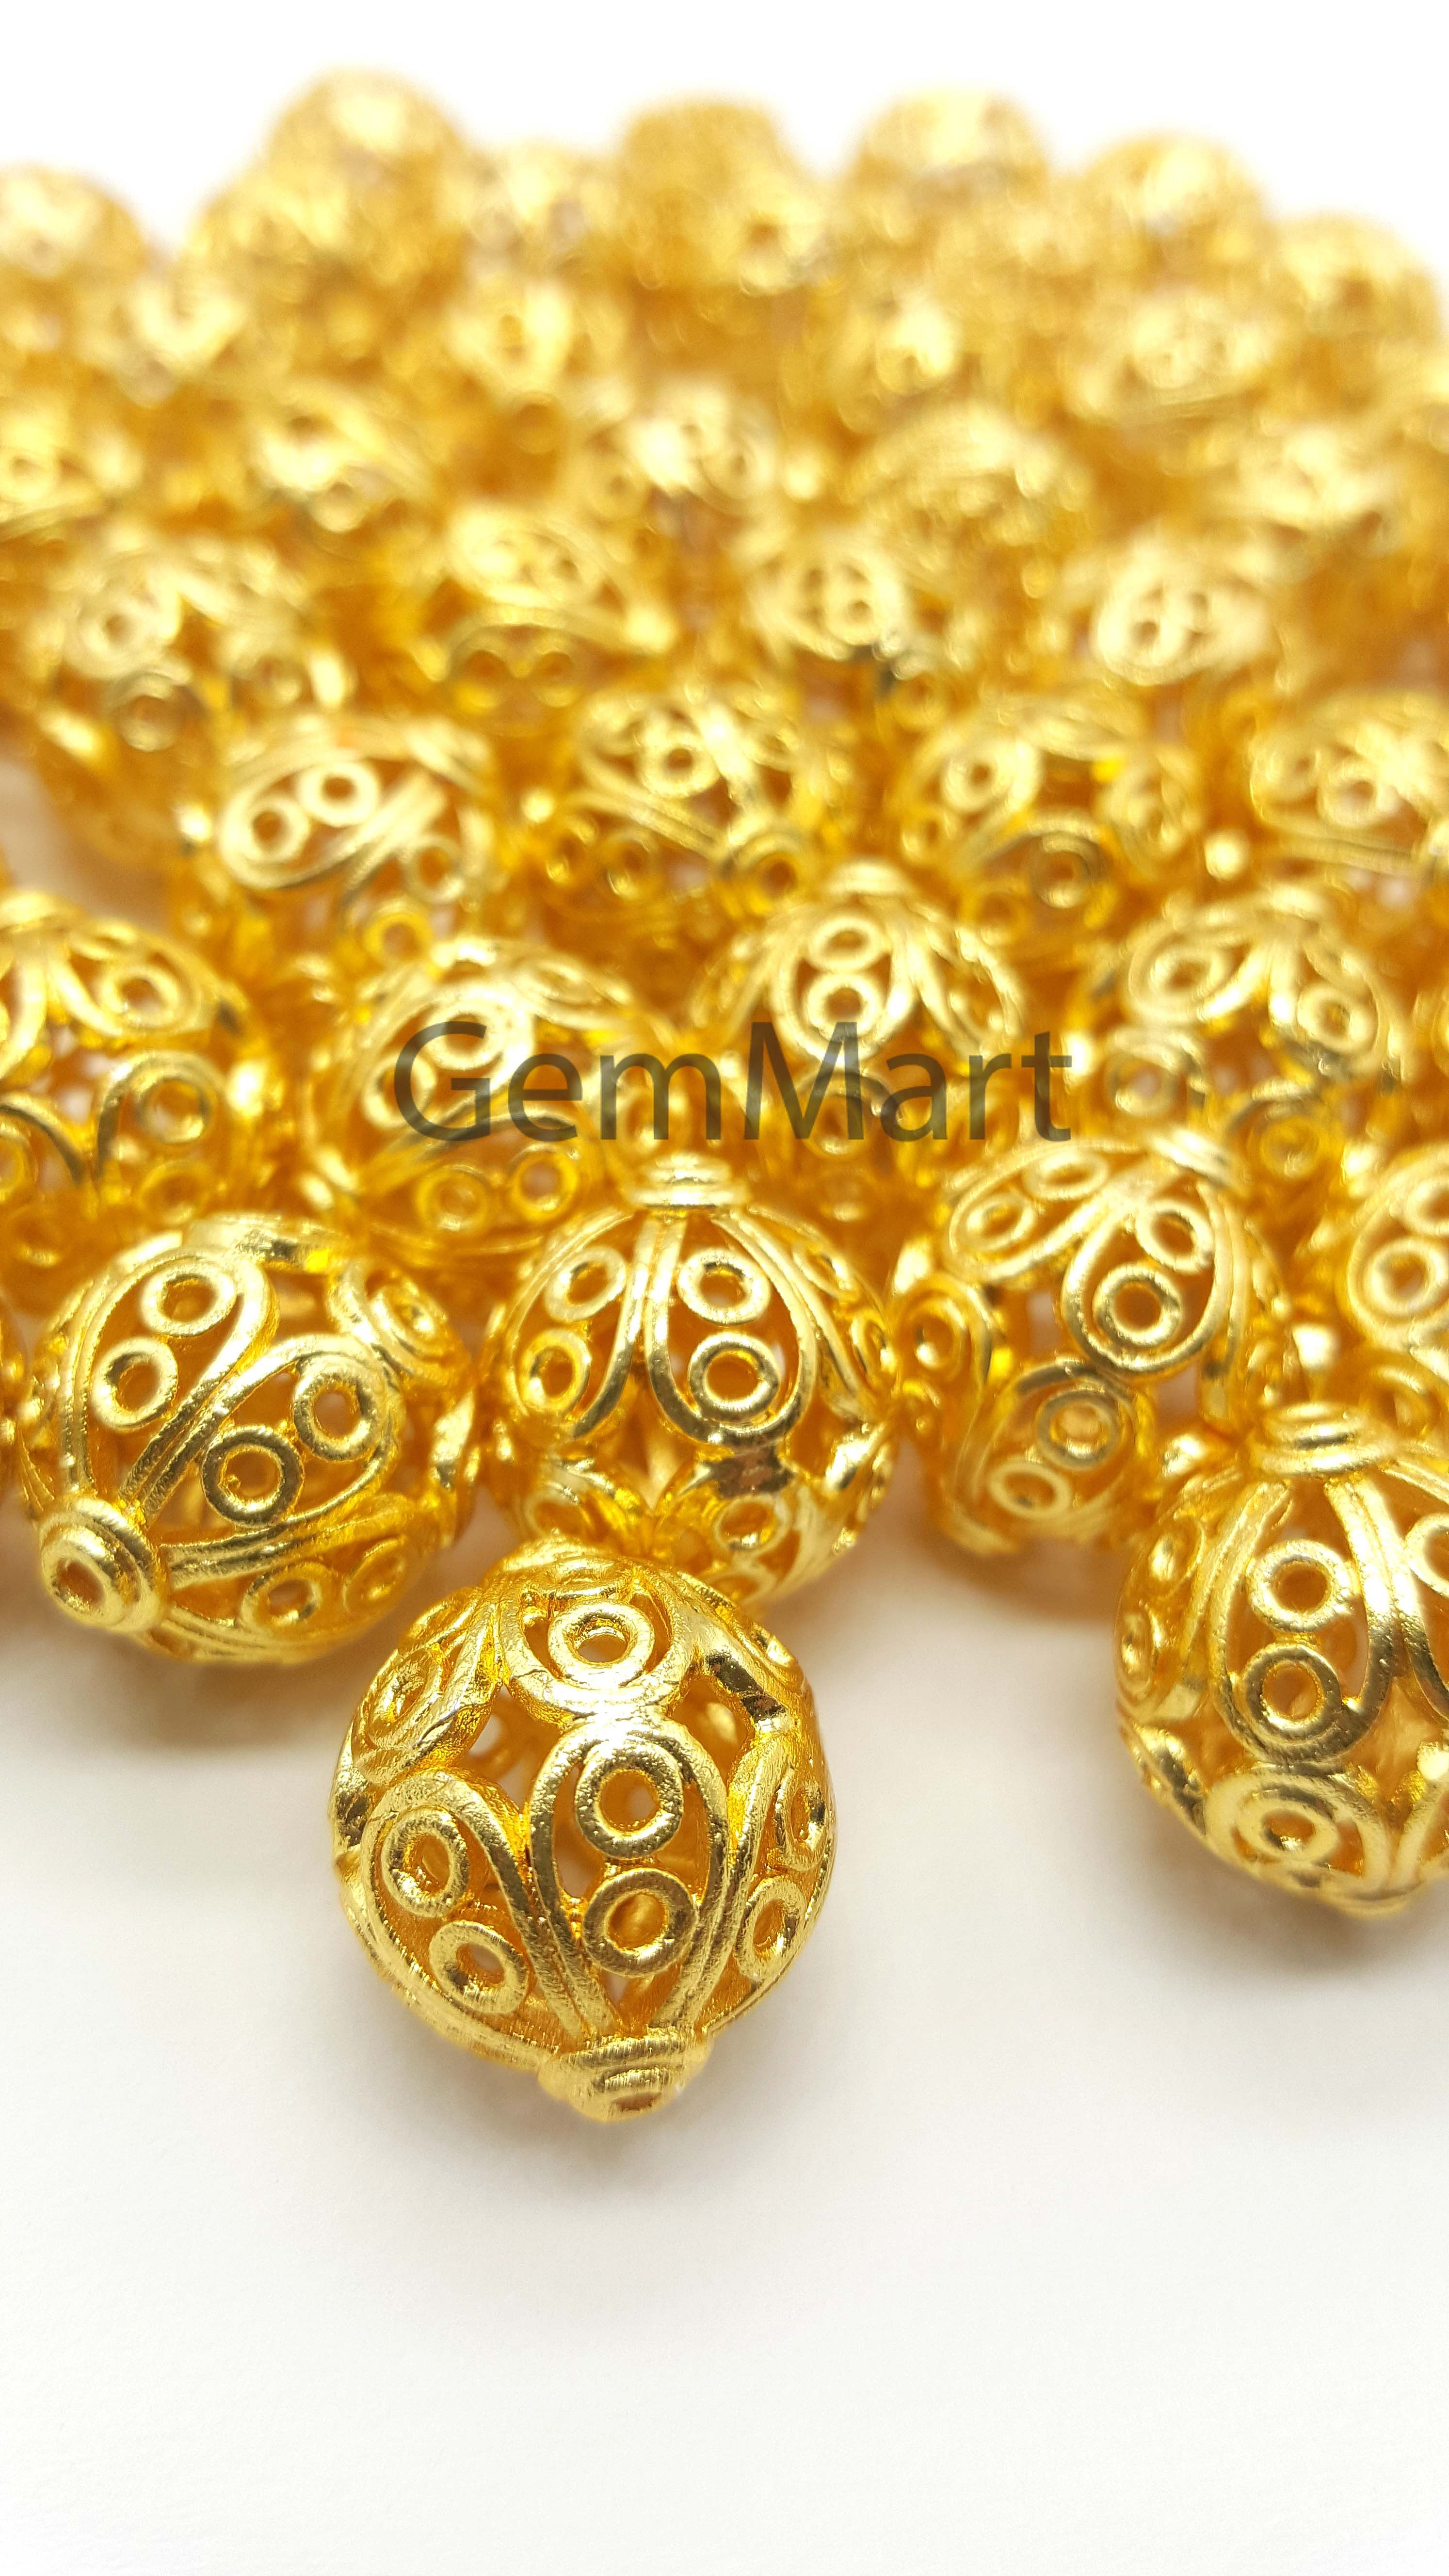 S04234 24x21x5 K-Gold plated Copper Unakite Gem Rabbit Pendant Bead